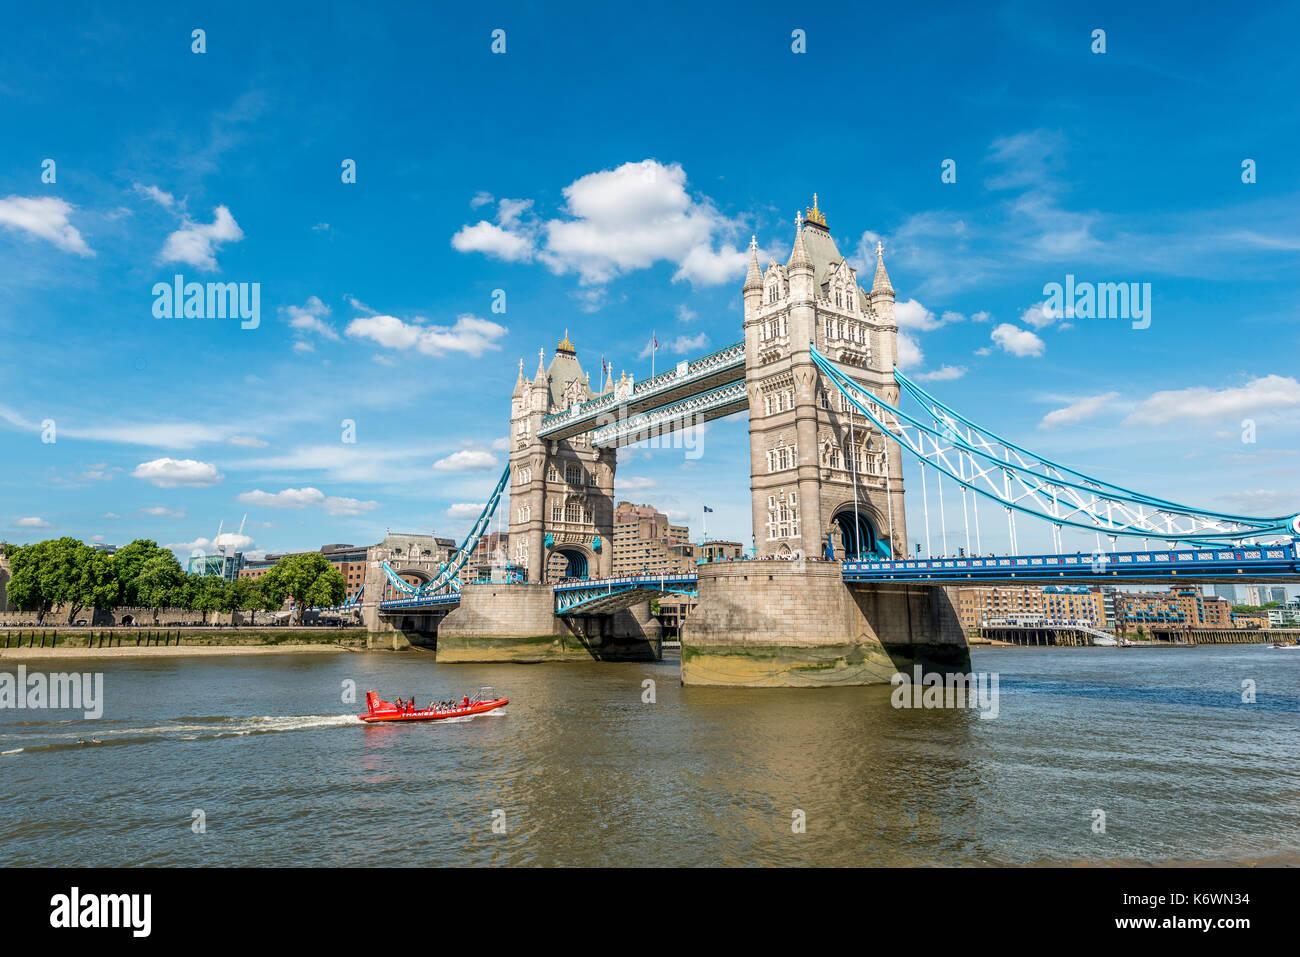 Tower Bridge sobre el Támesis, Southwark, Londres, Inglaterra, Gran Bretaña Imagen De Stock